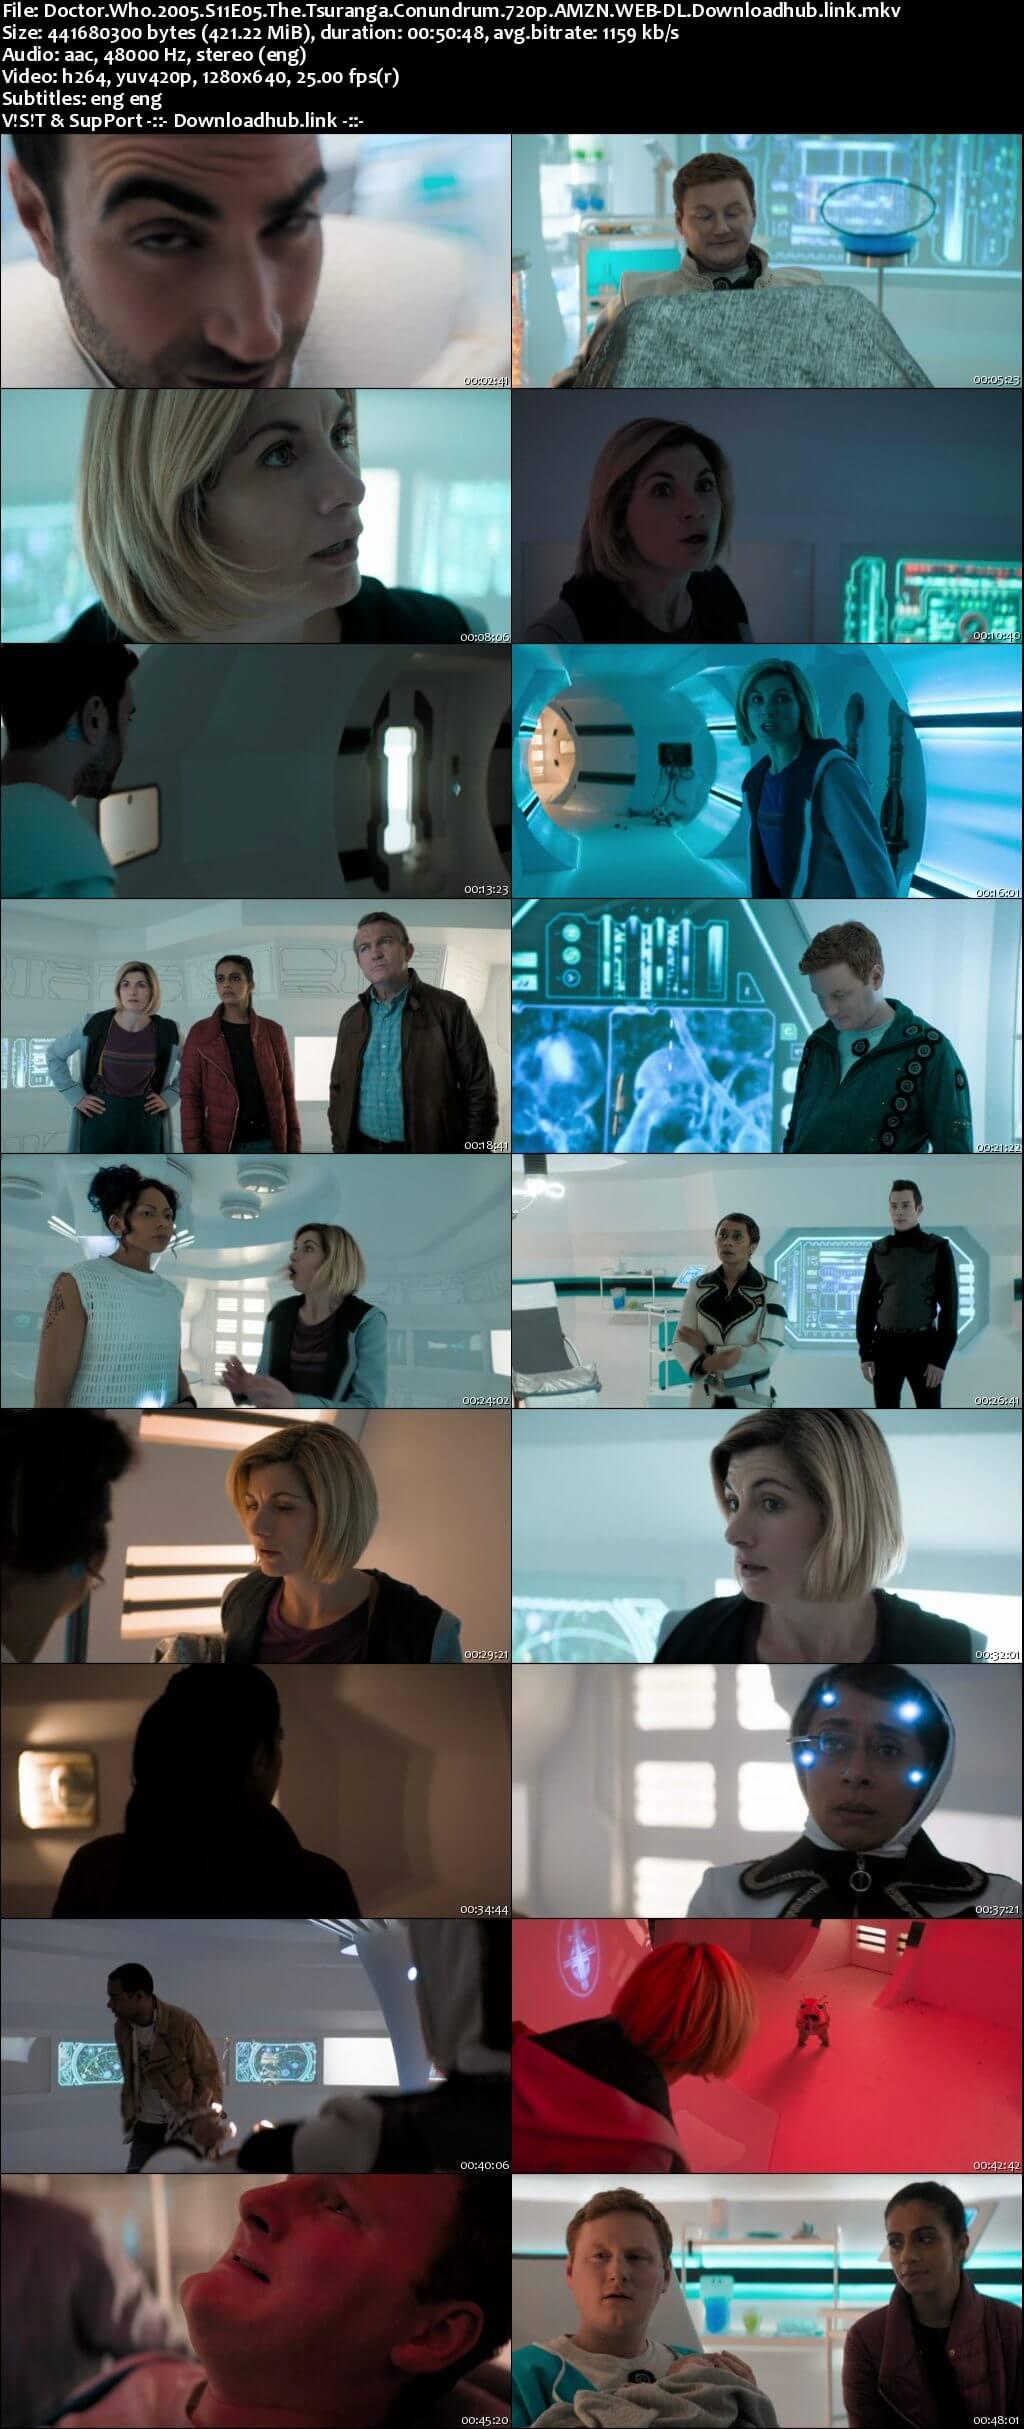 Doctor Who S11E05 400MB AMZN WEB-DL 720p ESubs